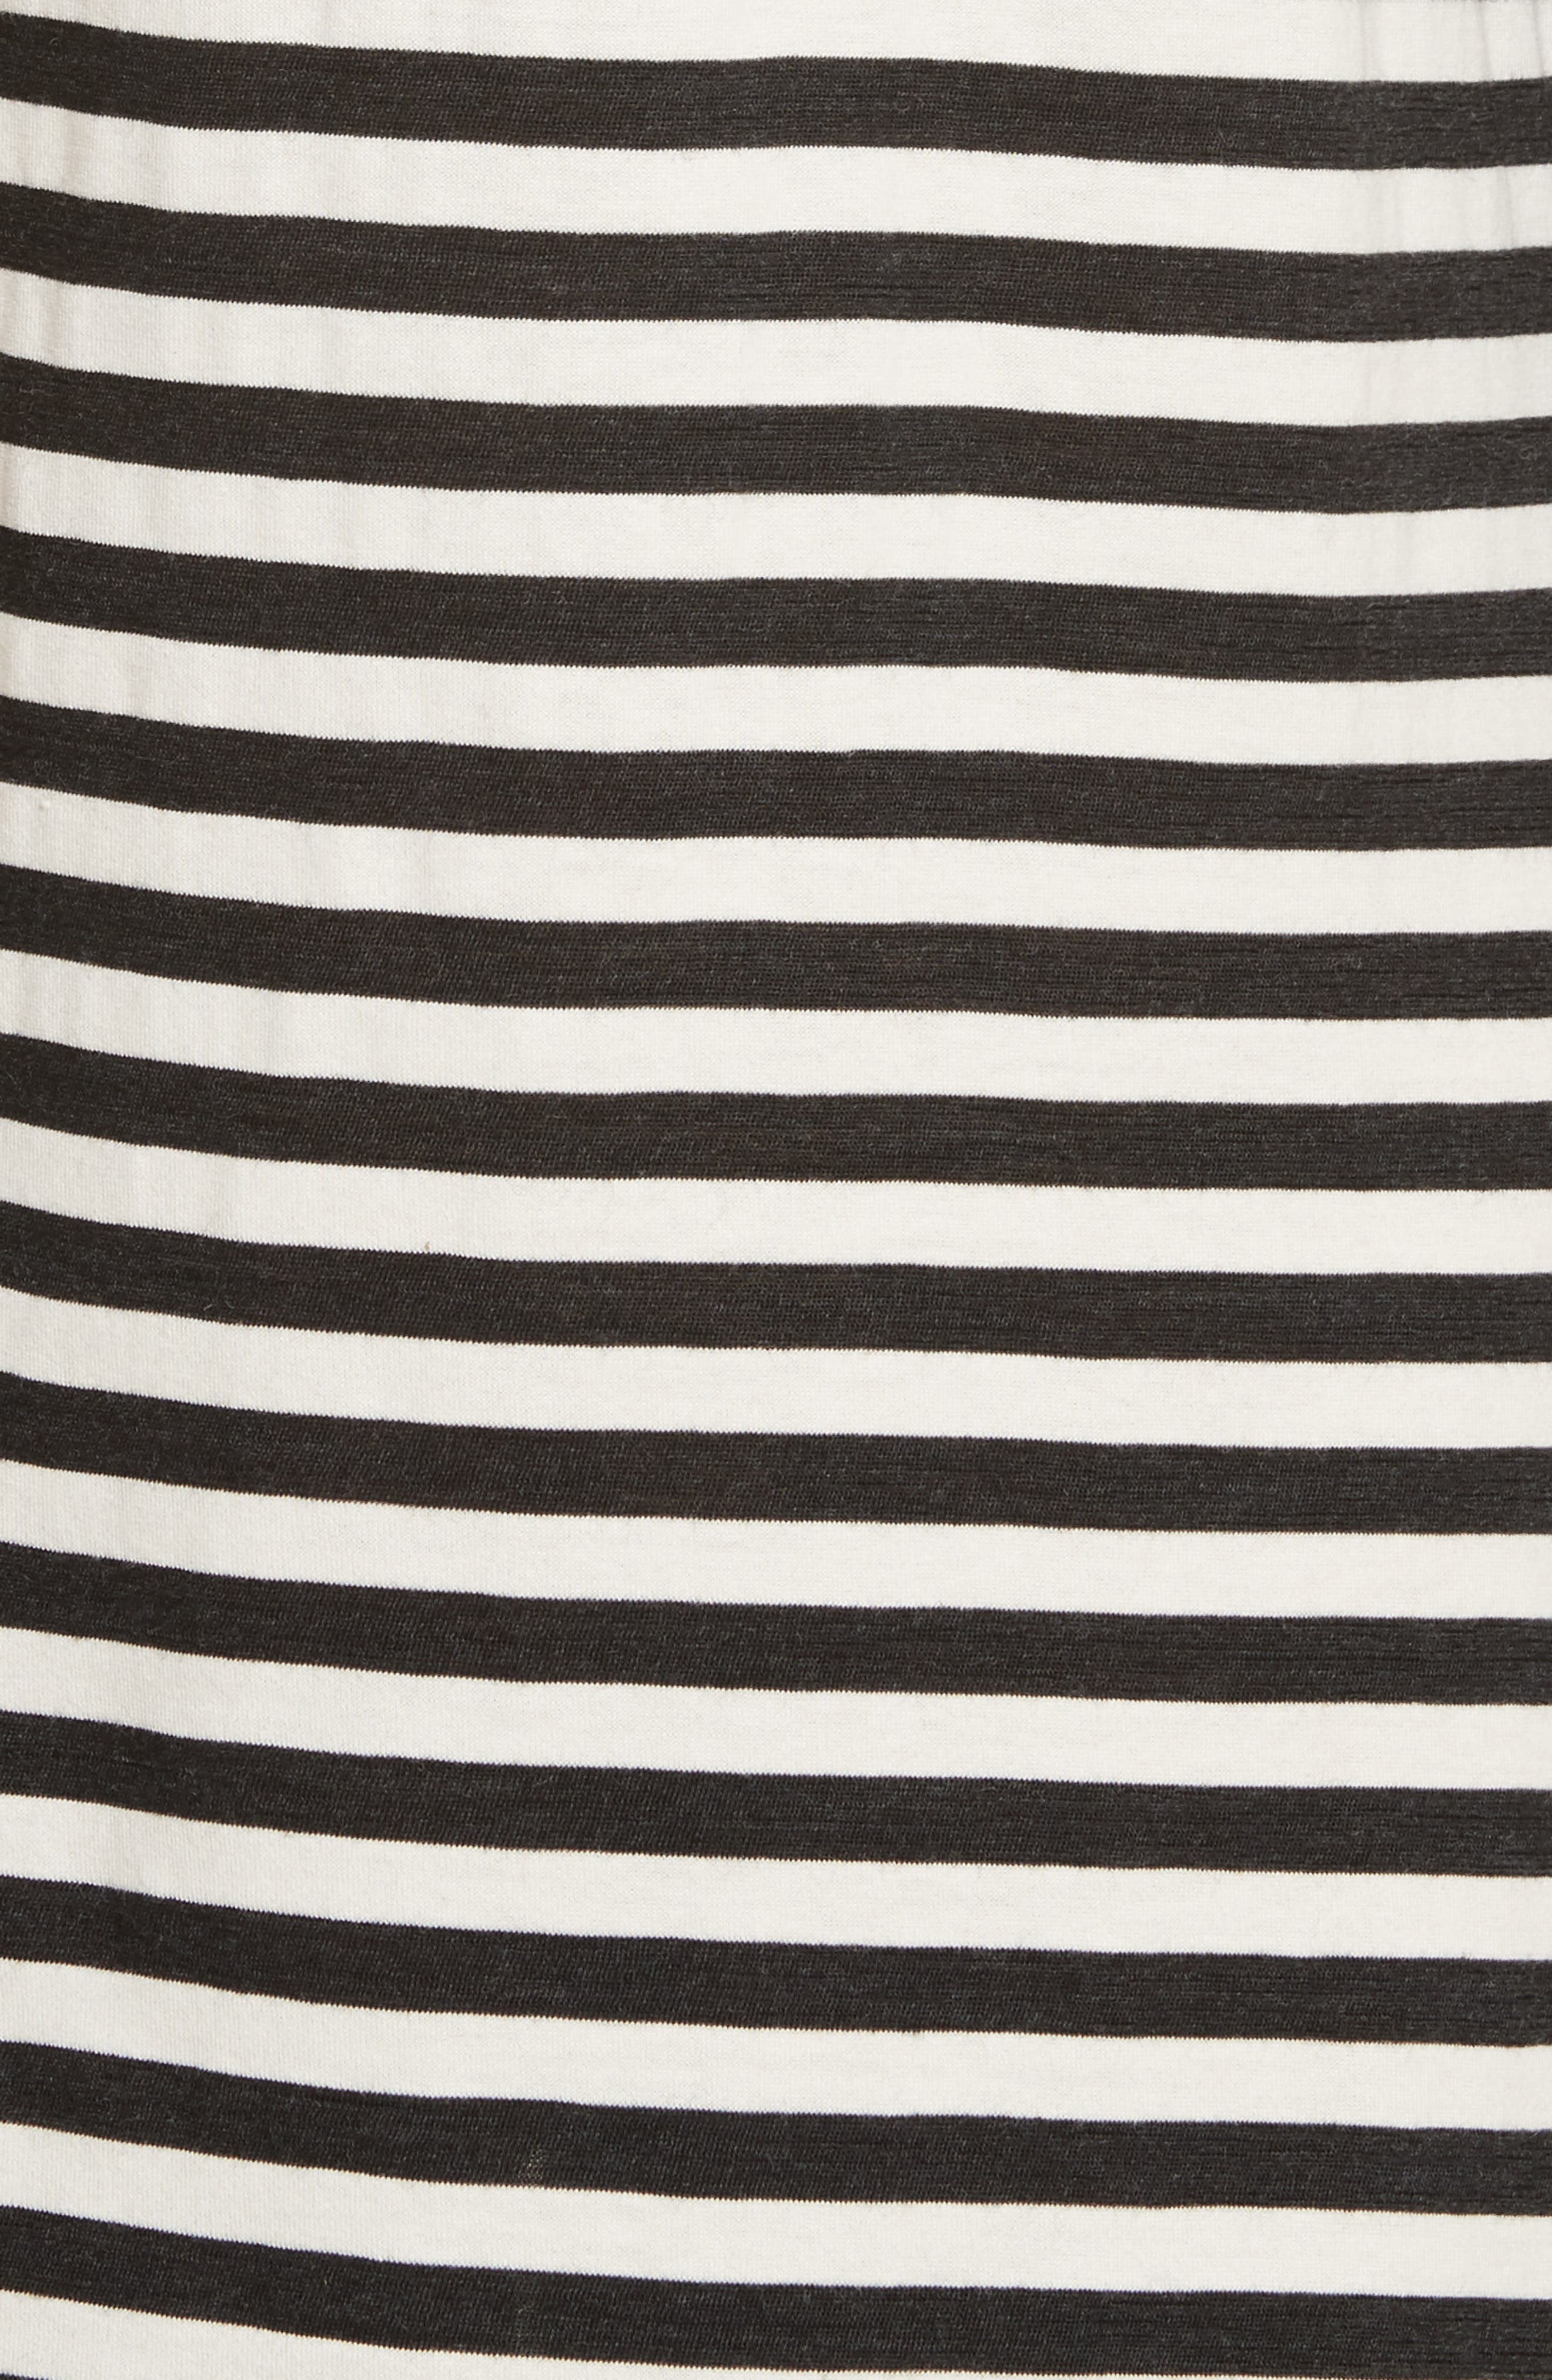 Stripe Jersey Cold Shoulder Dress,                             Alternate thumbnail 5, color,                             Black/ Cream